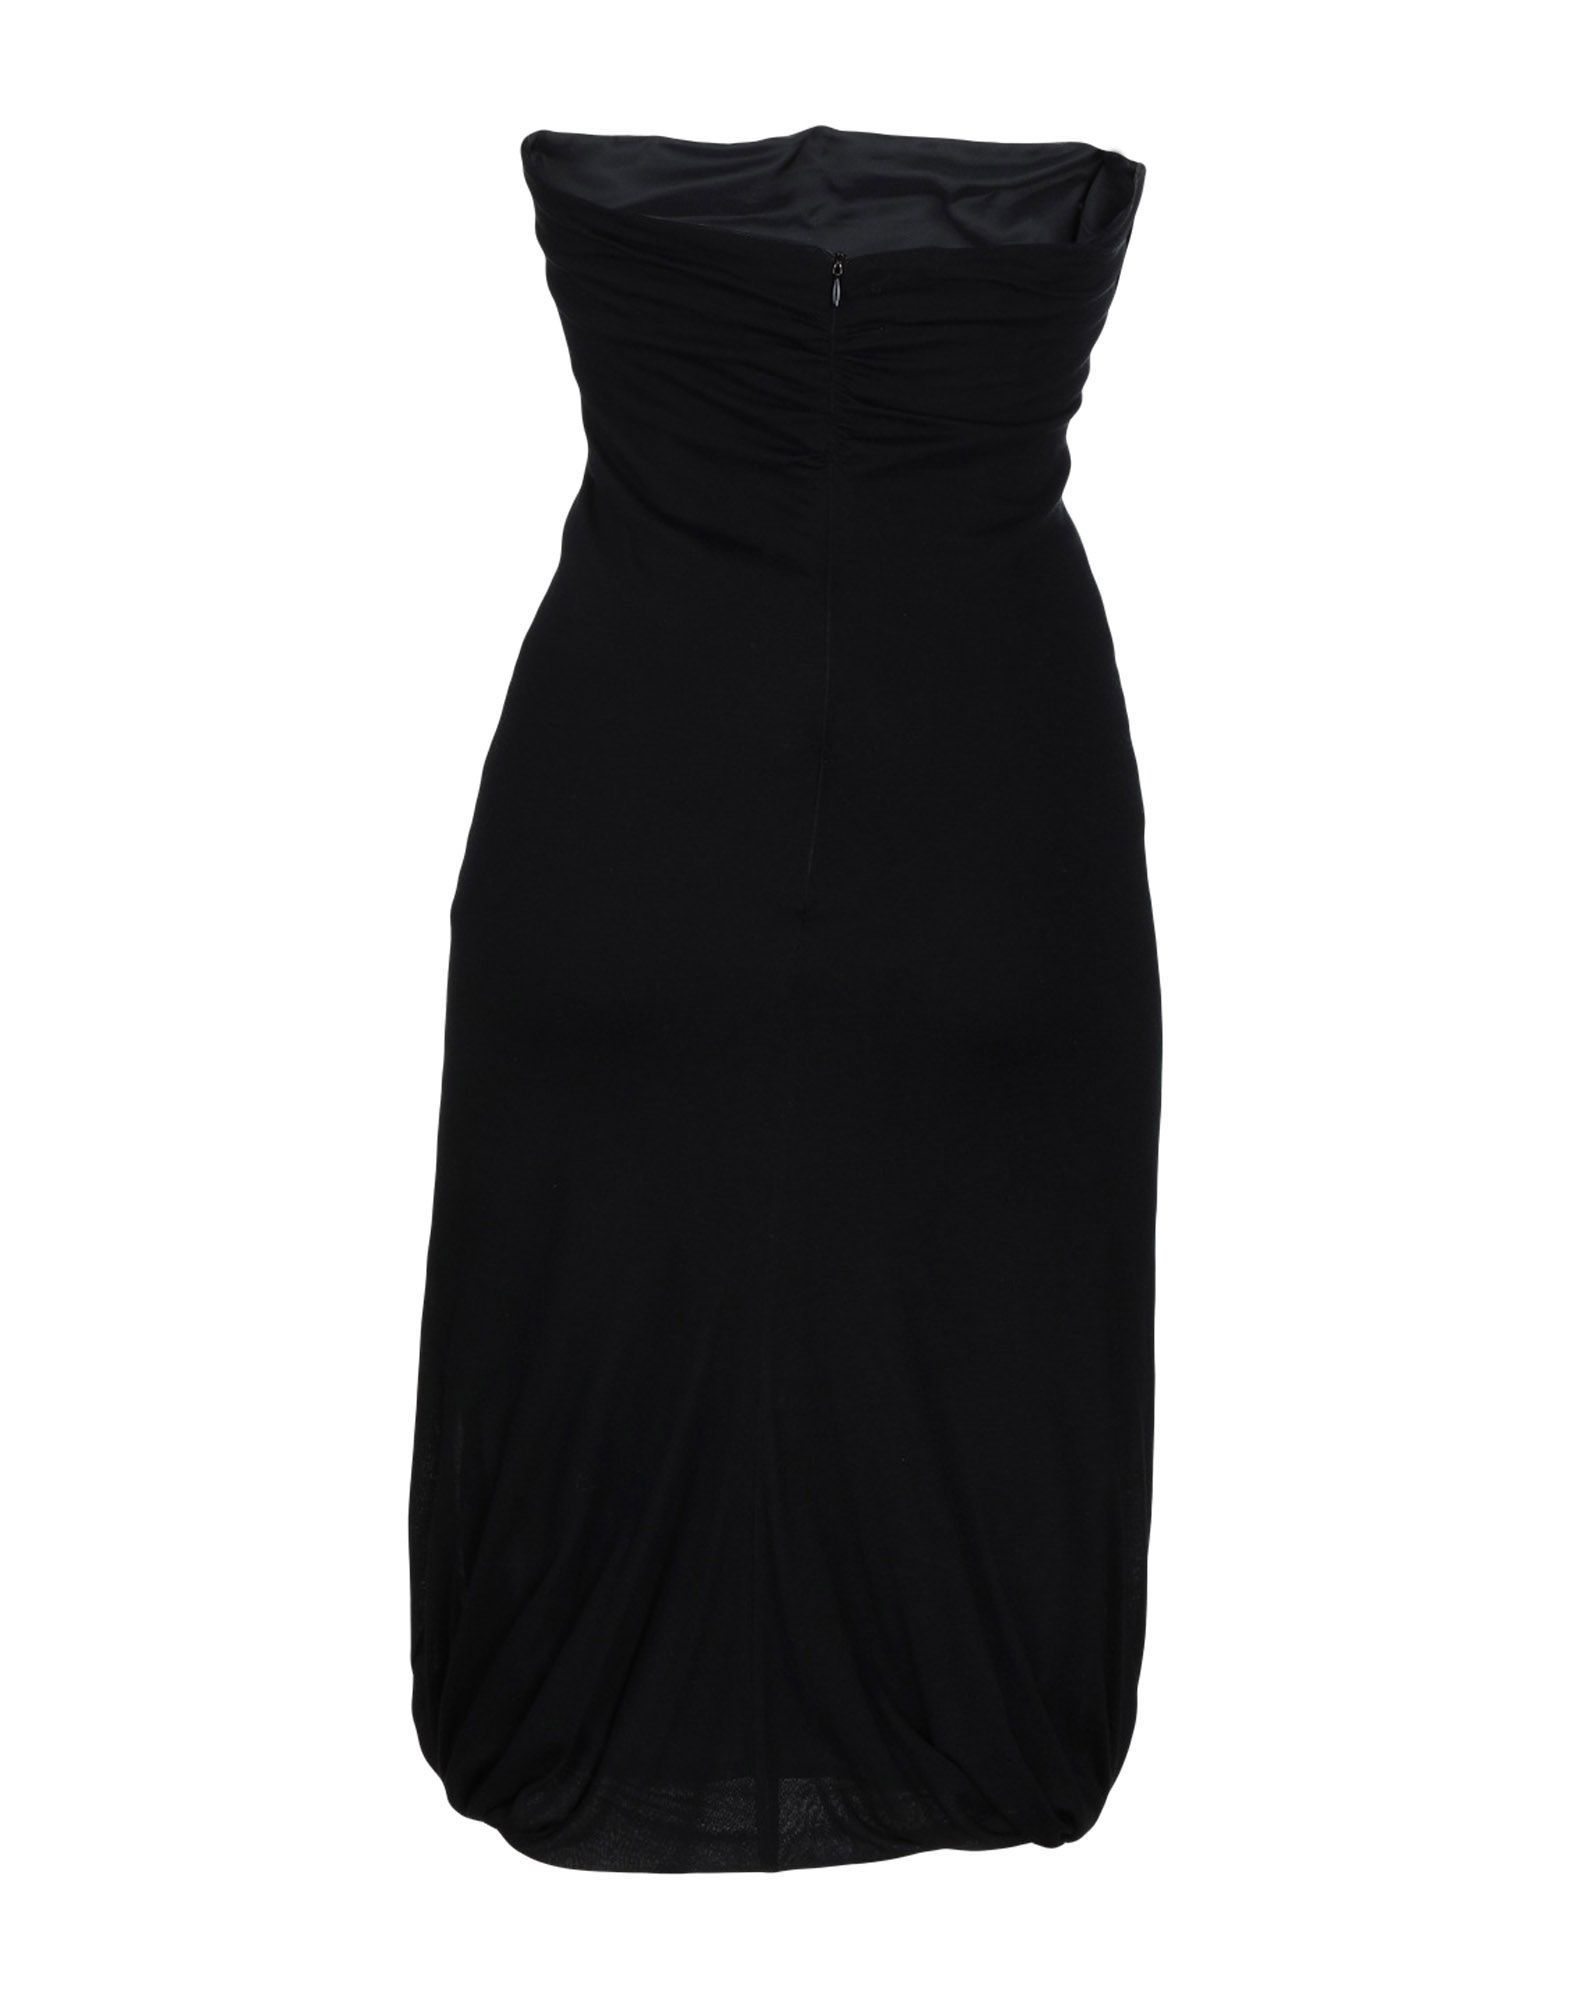 Alessandro Dell'Acqua Black Virgin Wool Draped Neckline Dress